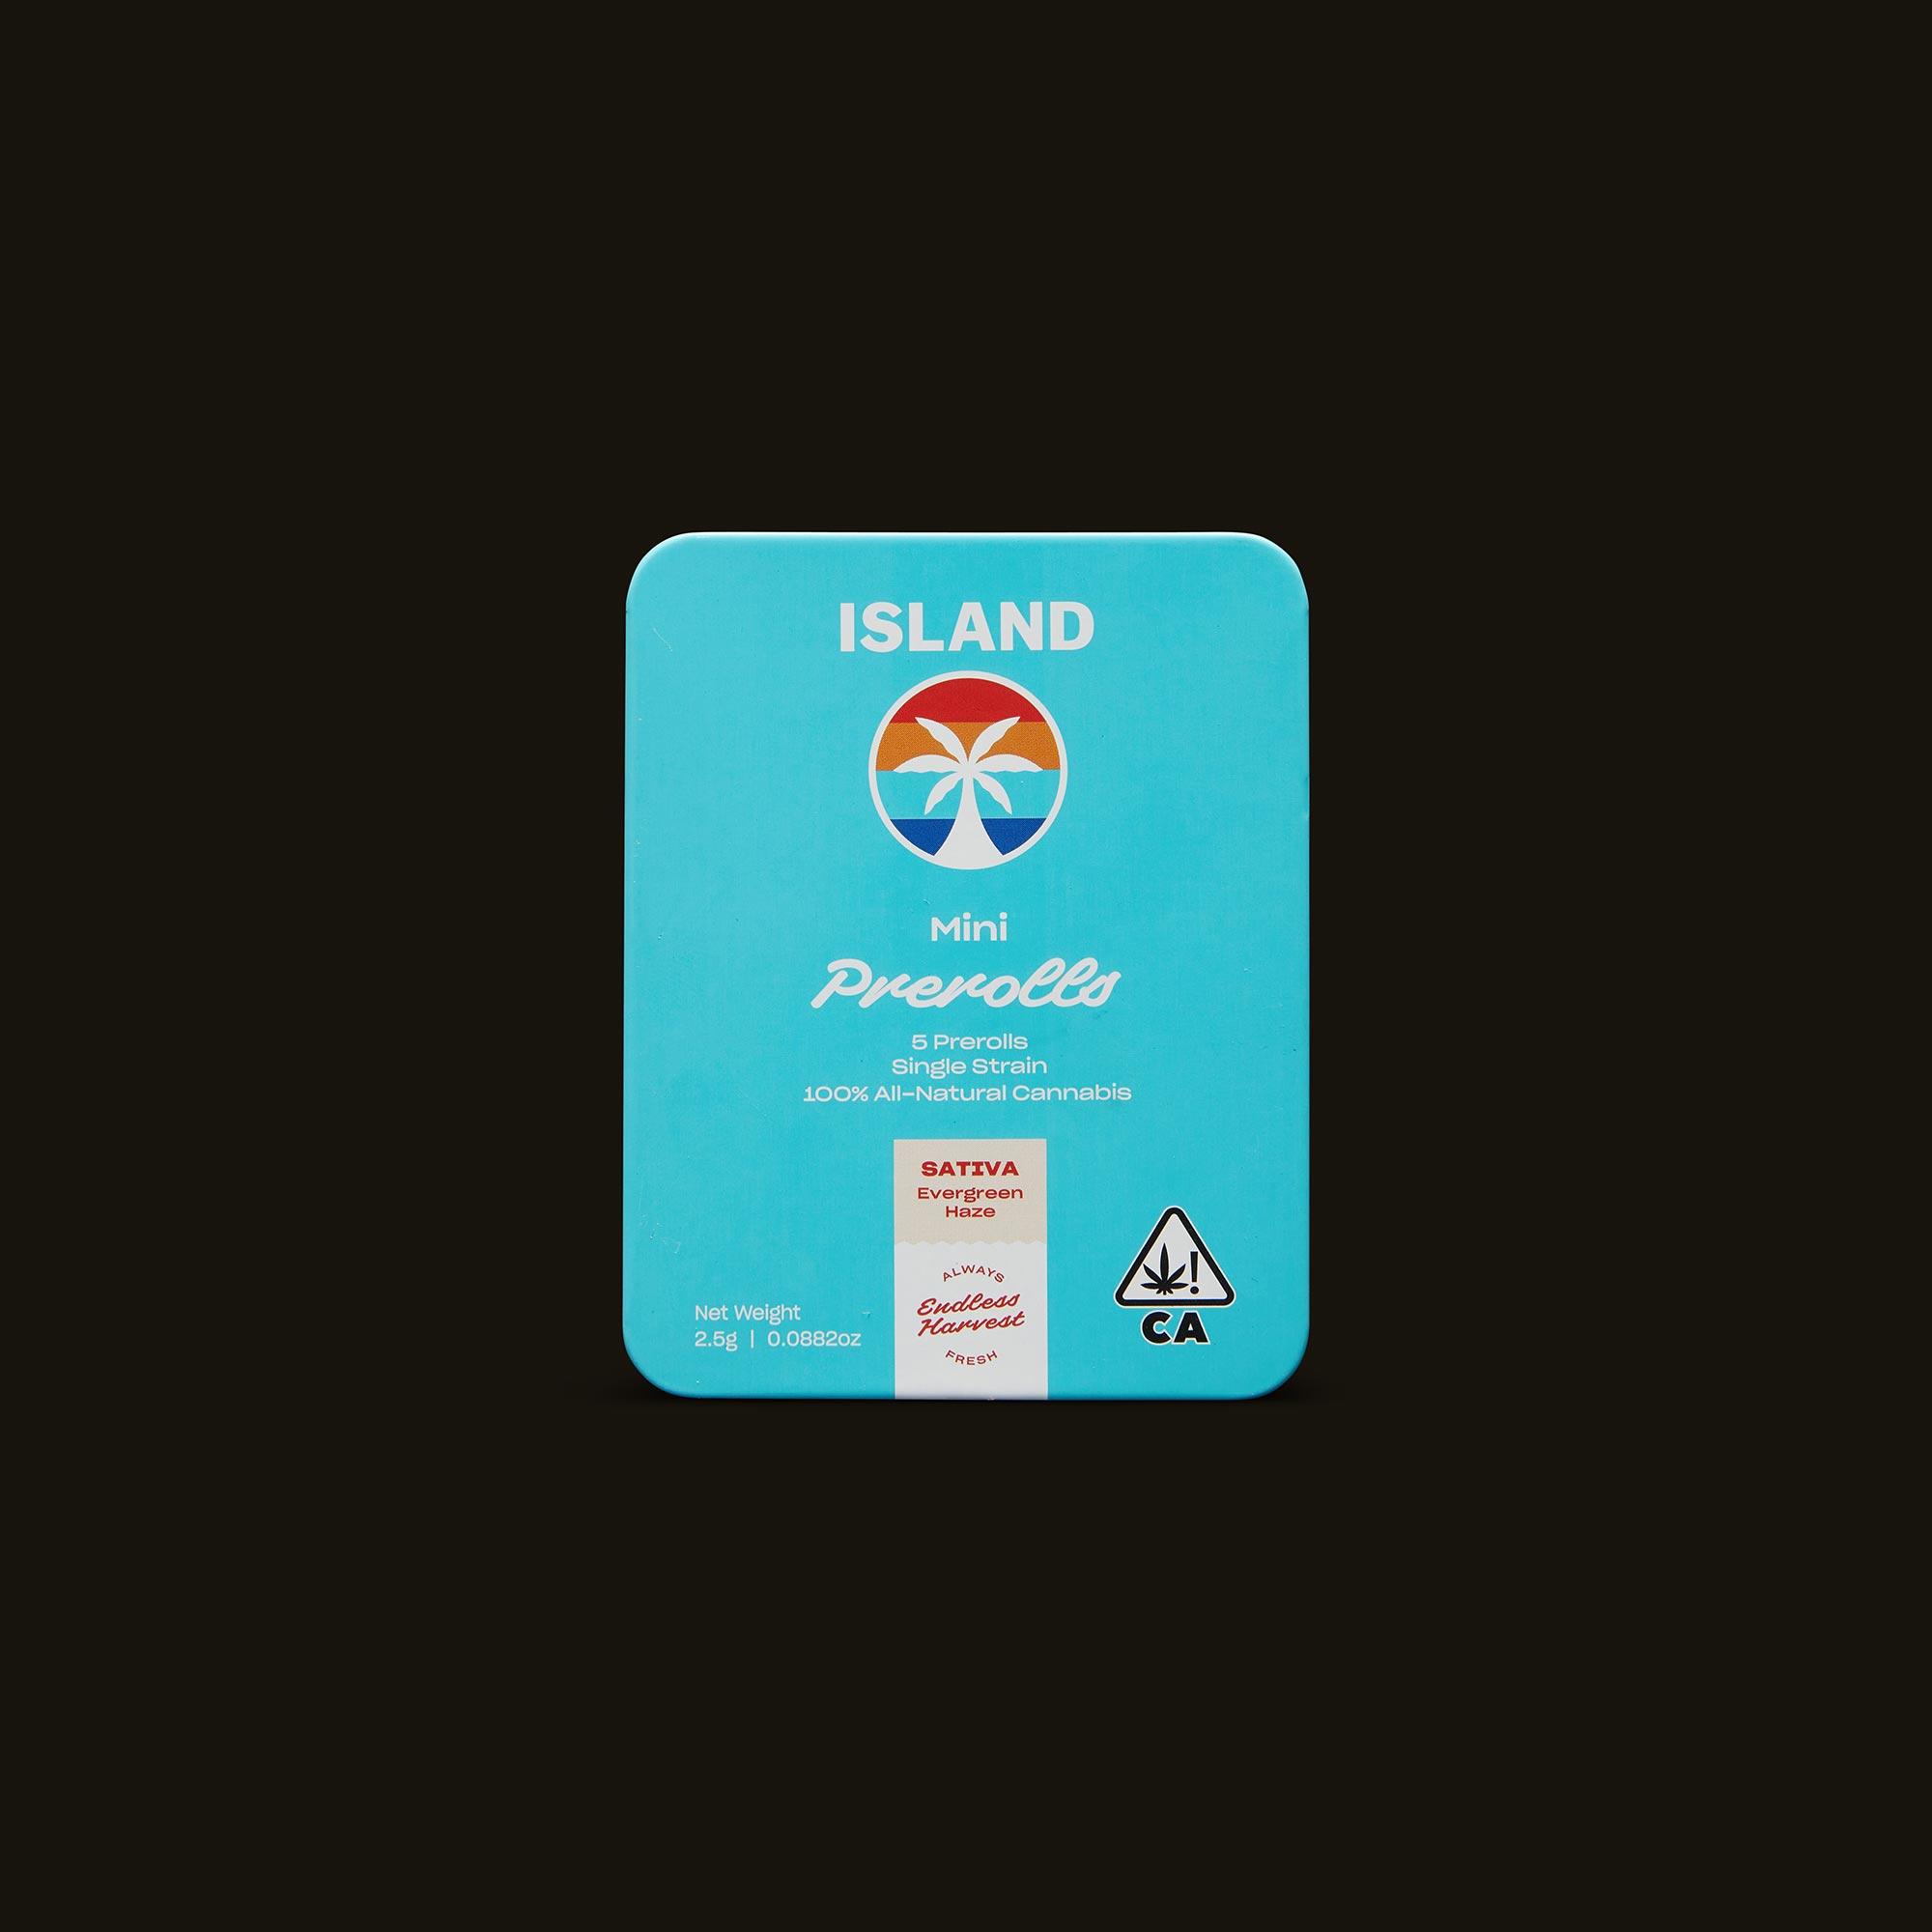 Island Evergreen Haze Mini's Front Packaging